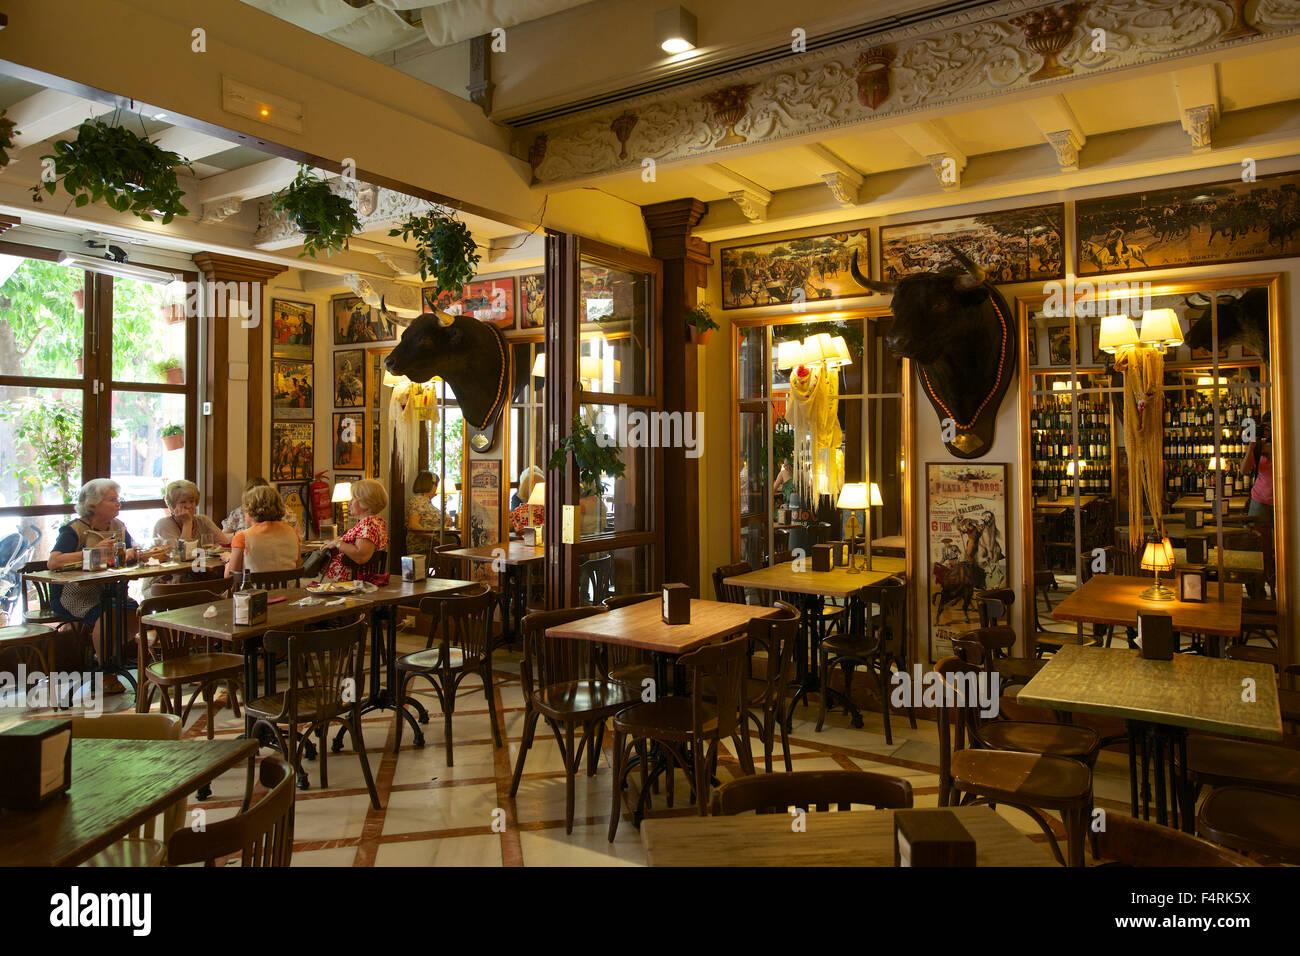 La Catedral Cafe Restaurant